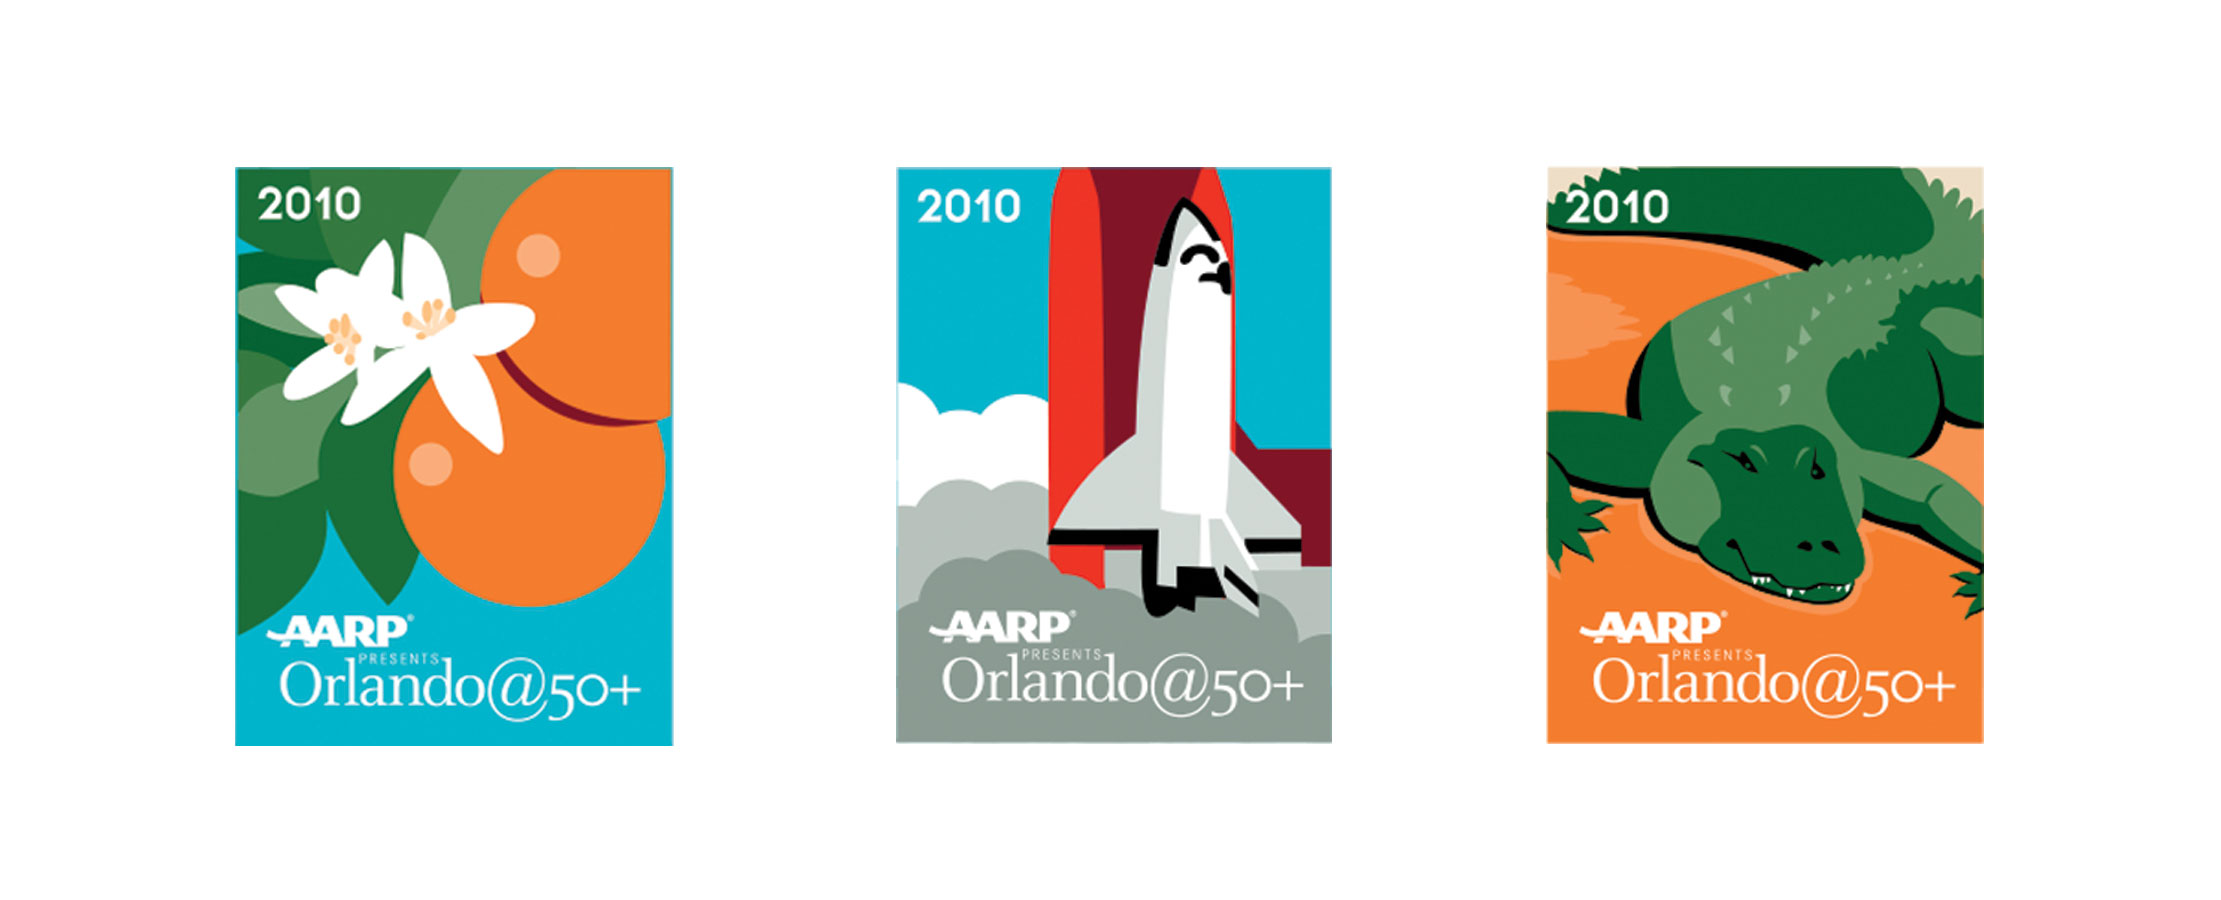 graphic design annapolis washington, dc